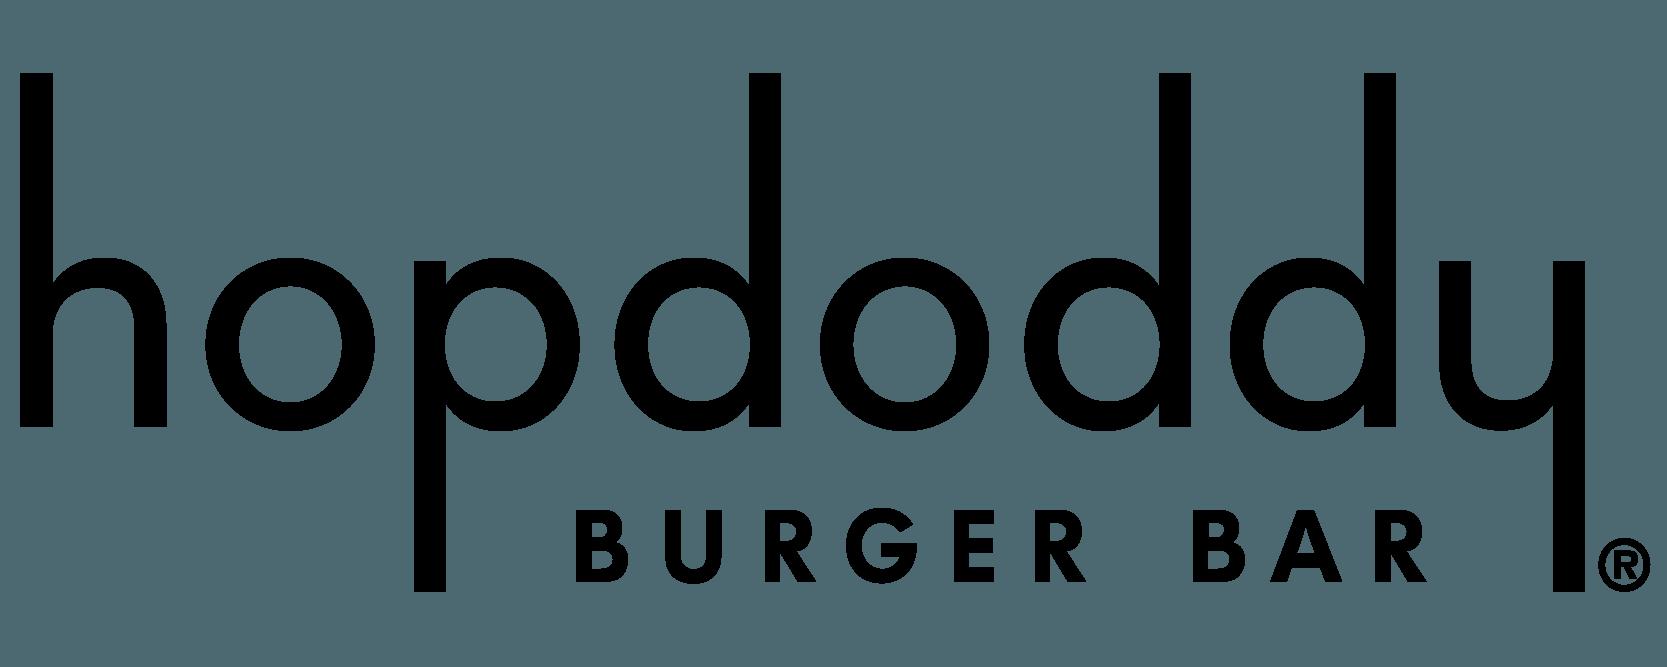 Customer logo for Hopdoddy